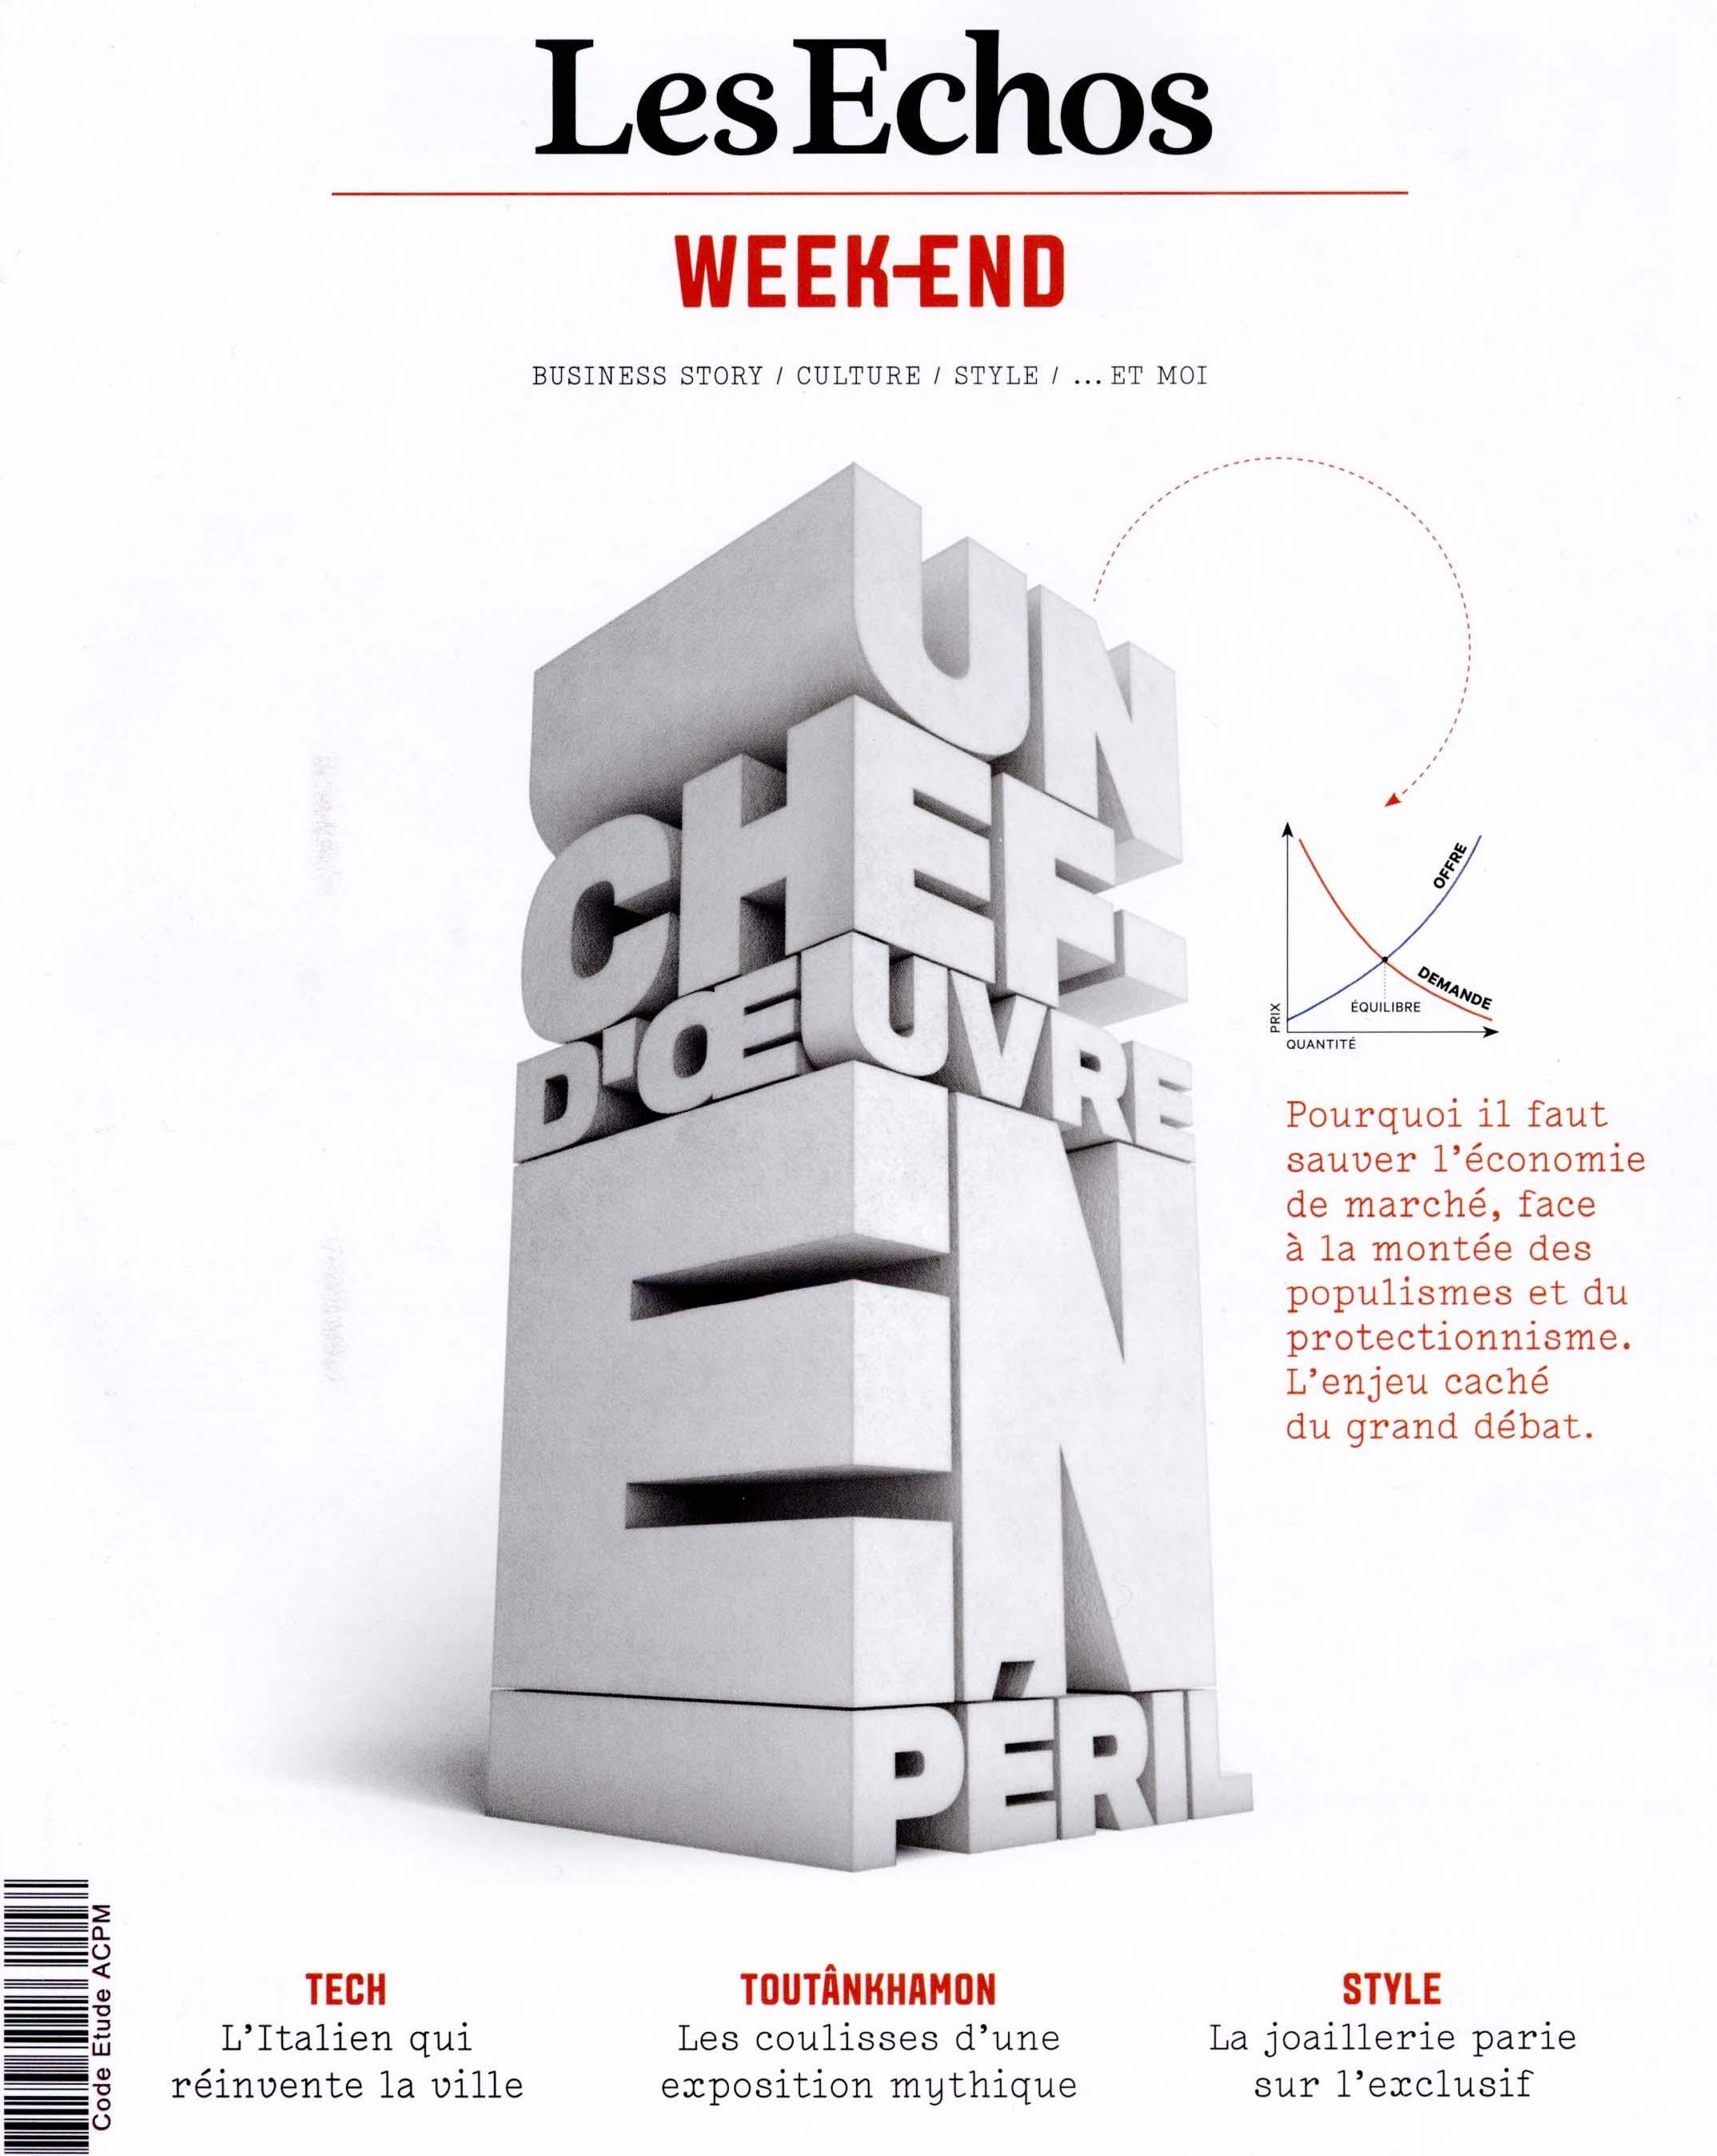 LES ECHOS WEEK-END 15 mar 19 TATIANA VERSTRAETEN cover _recoupé.jpg